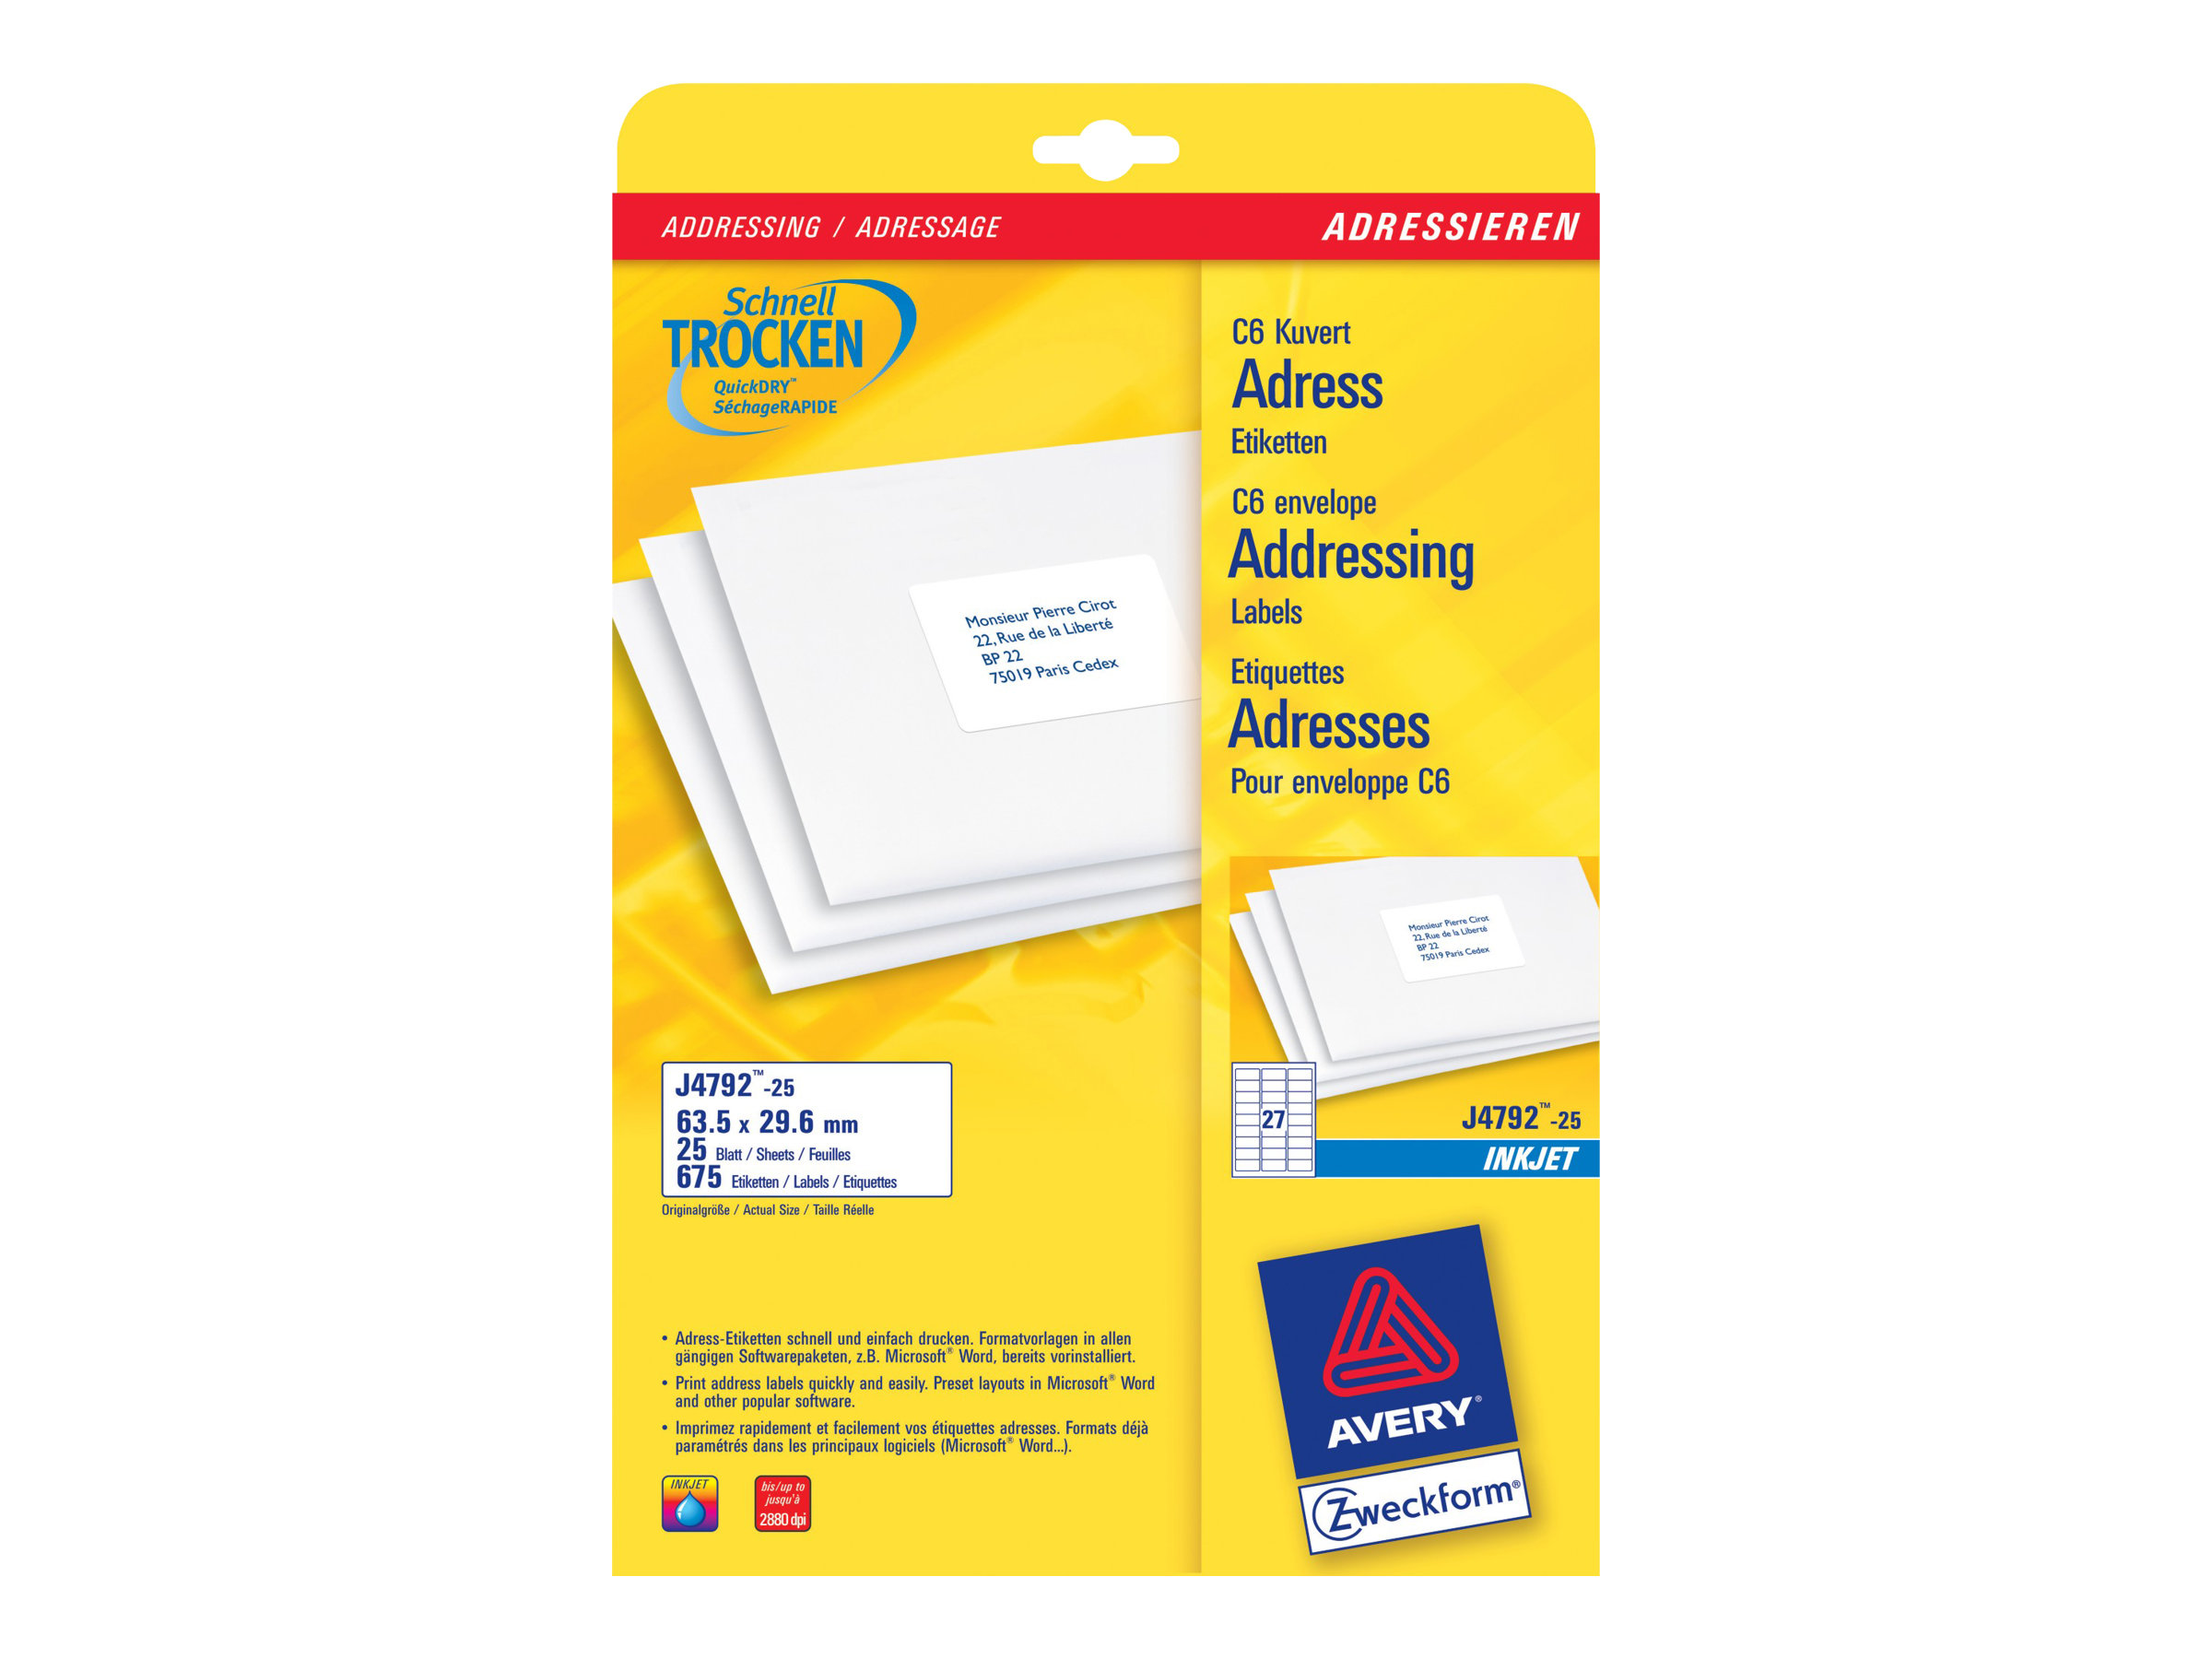 Avery Zweckform J4792 - Weiß - 29.6 x 63.5 mm 675 Etikett(en) (25 Bogen x 27) Adressetiketten